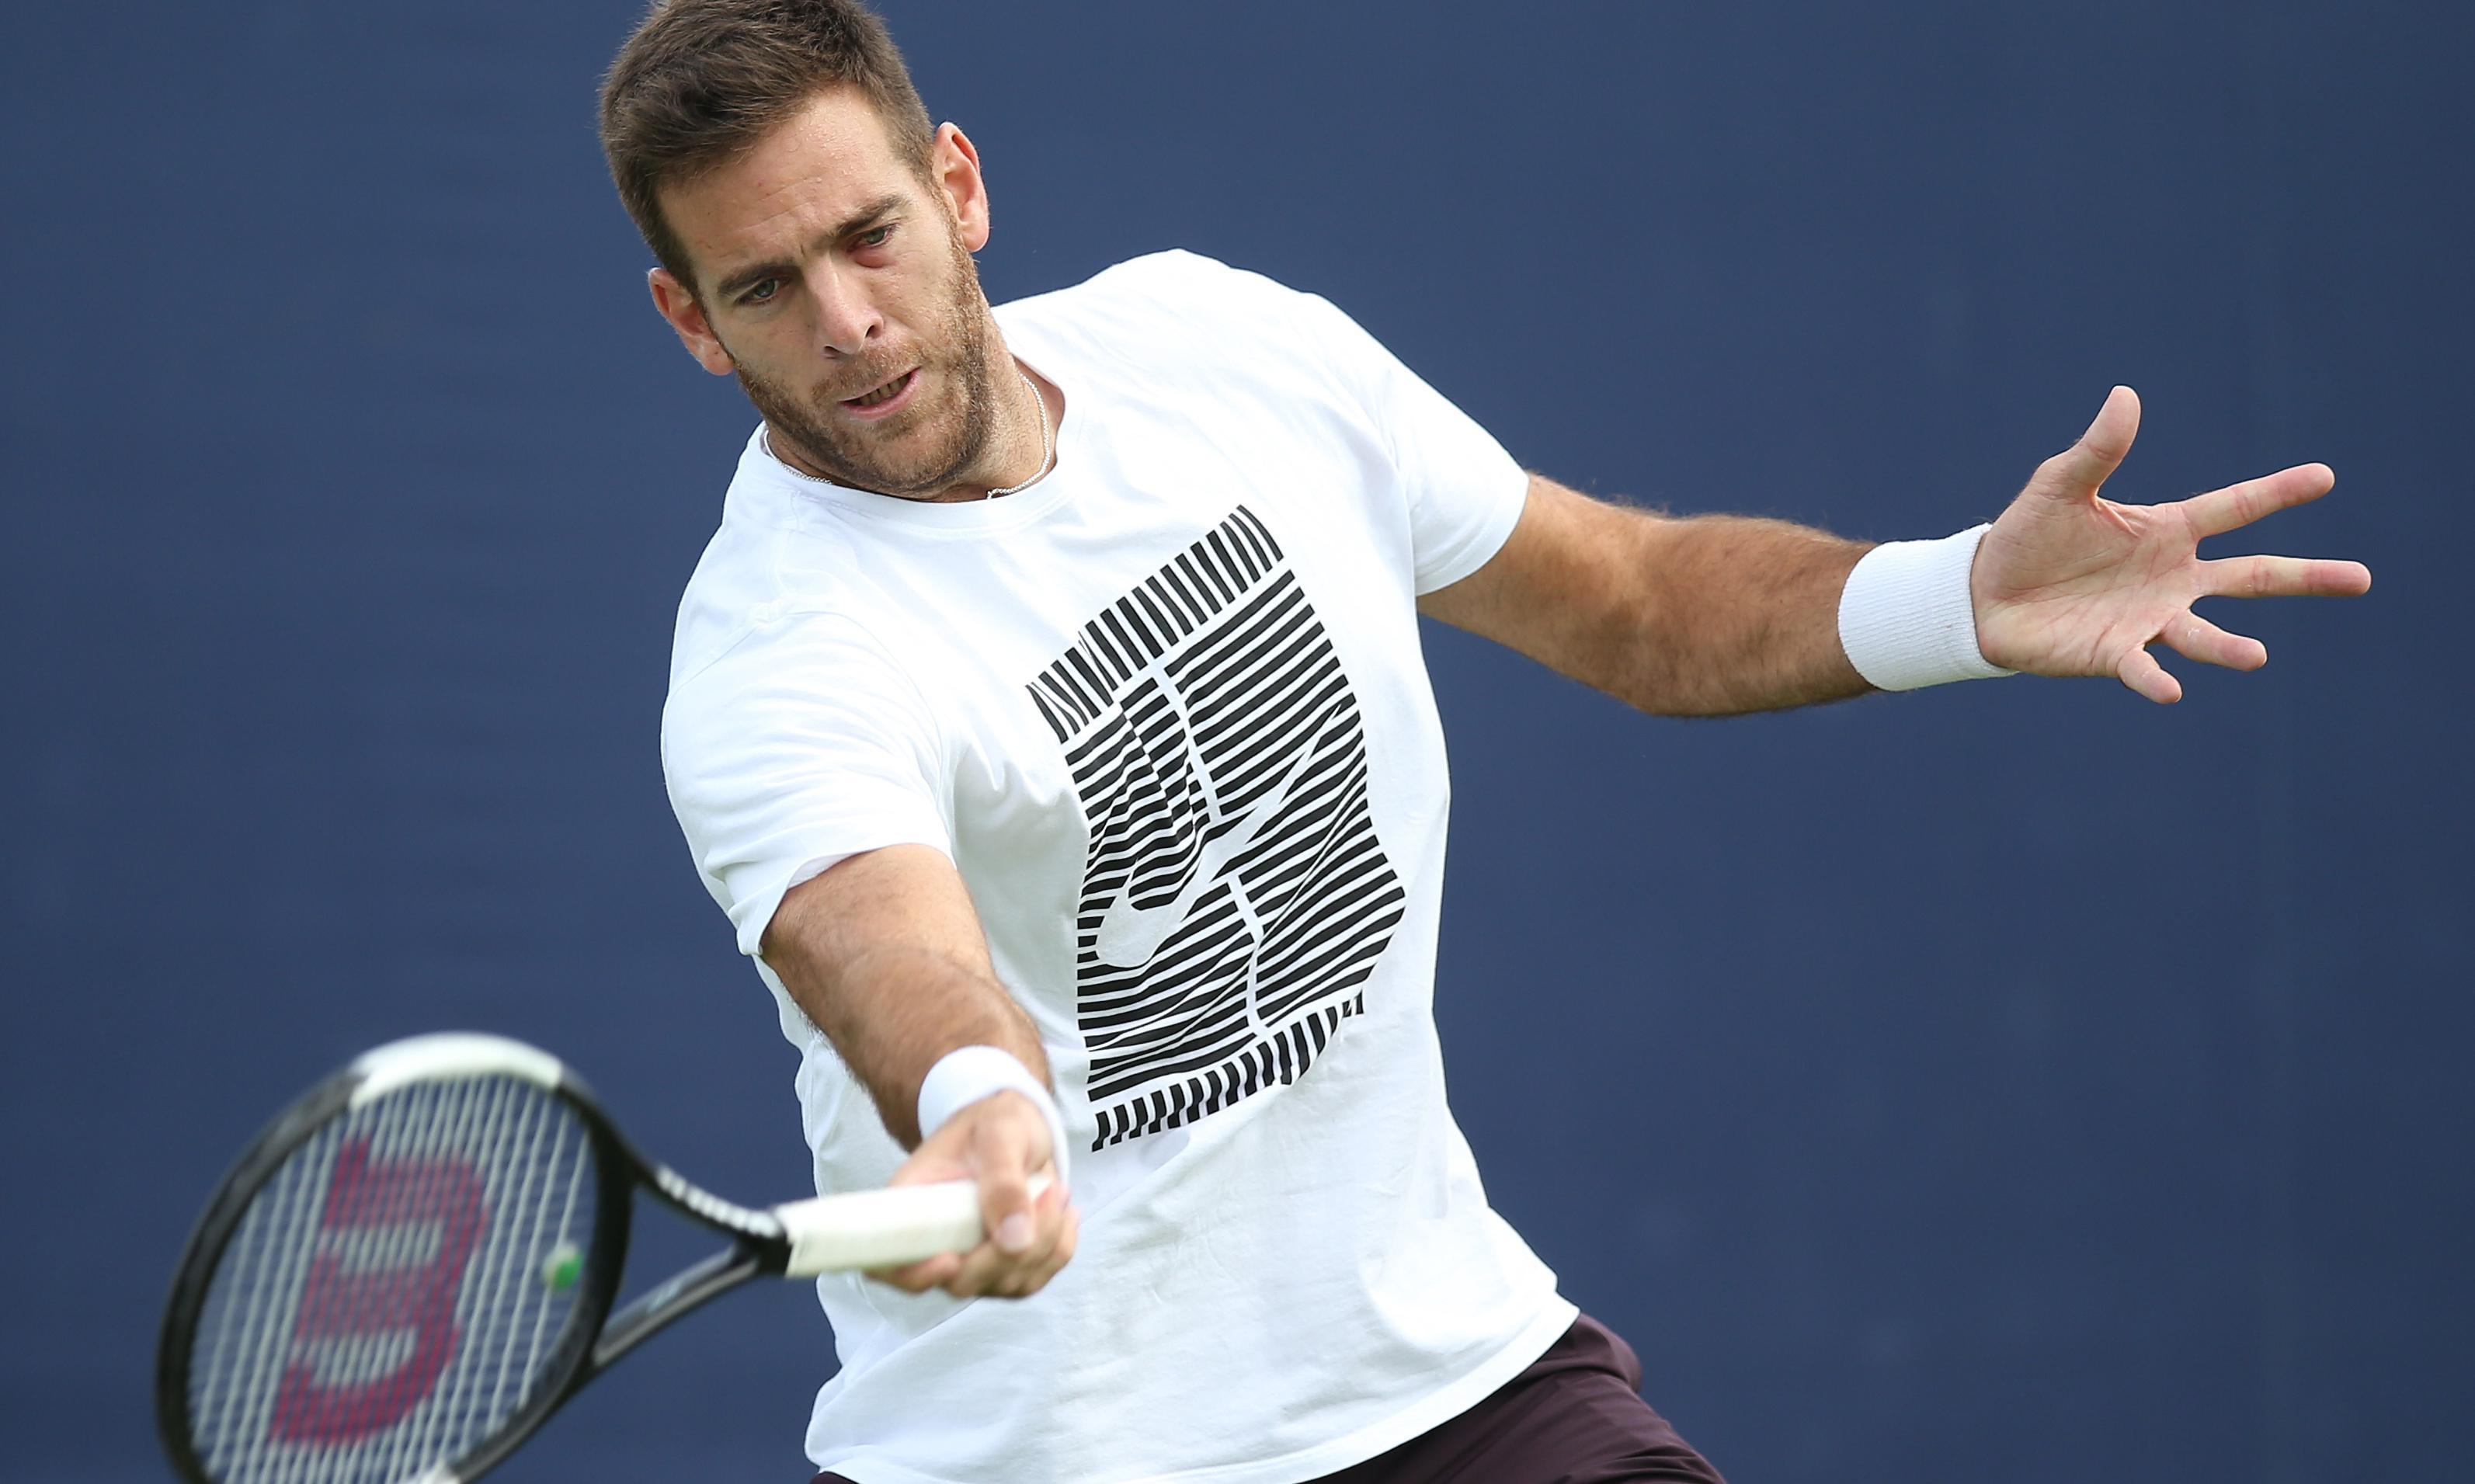 Andy Murray has the talent to make comeback, says Juan Martín del Potro